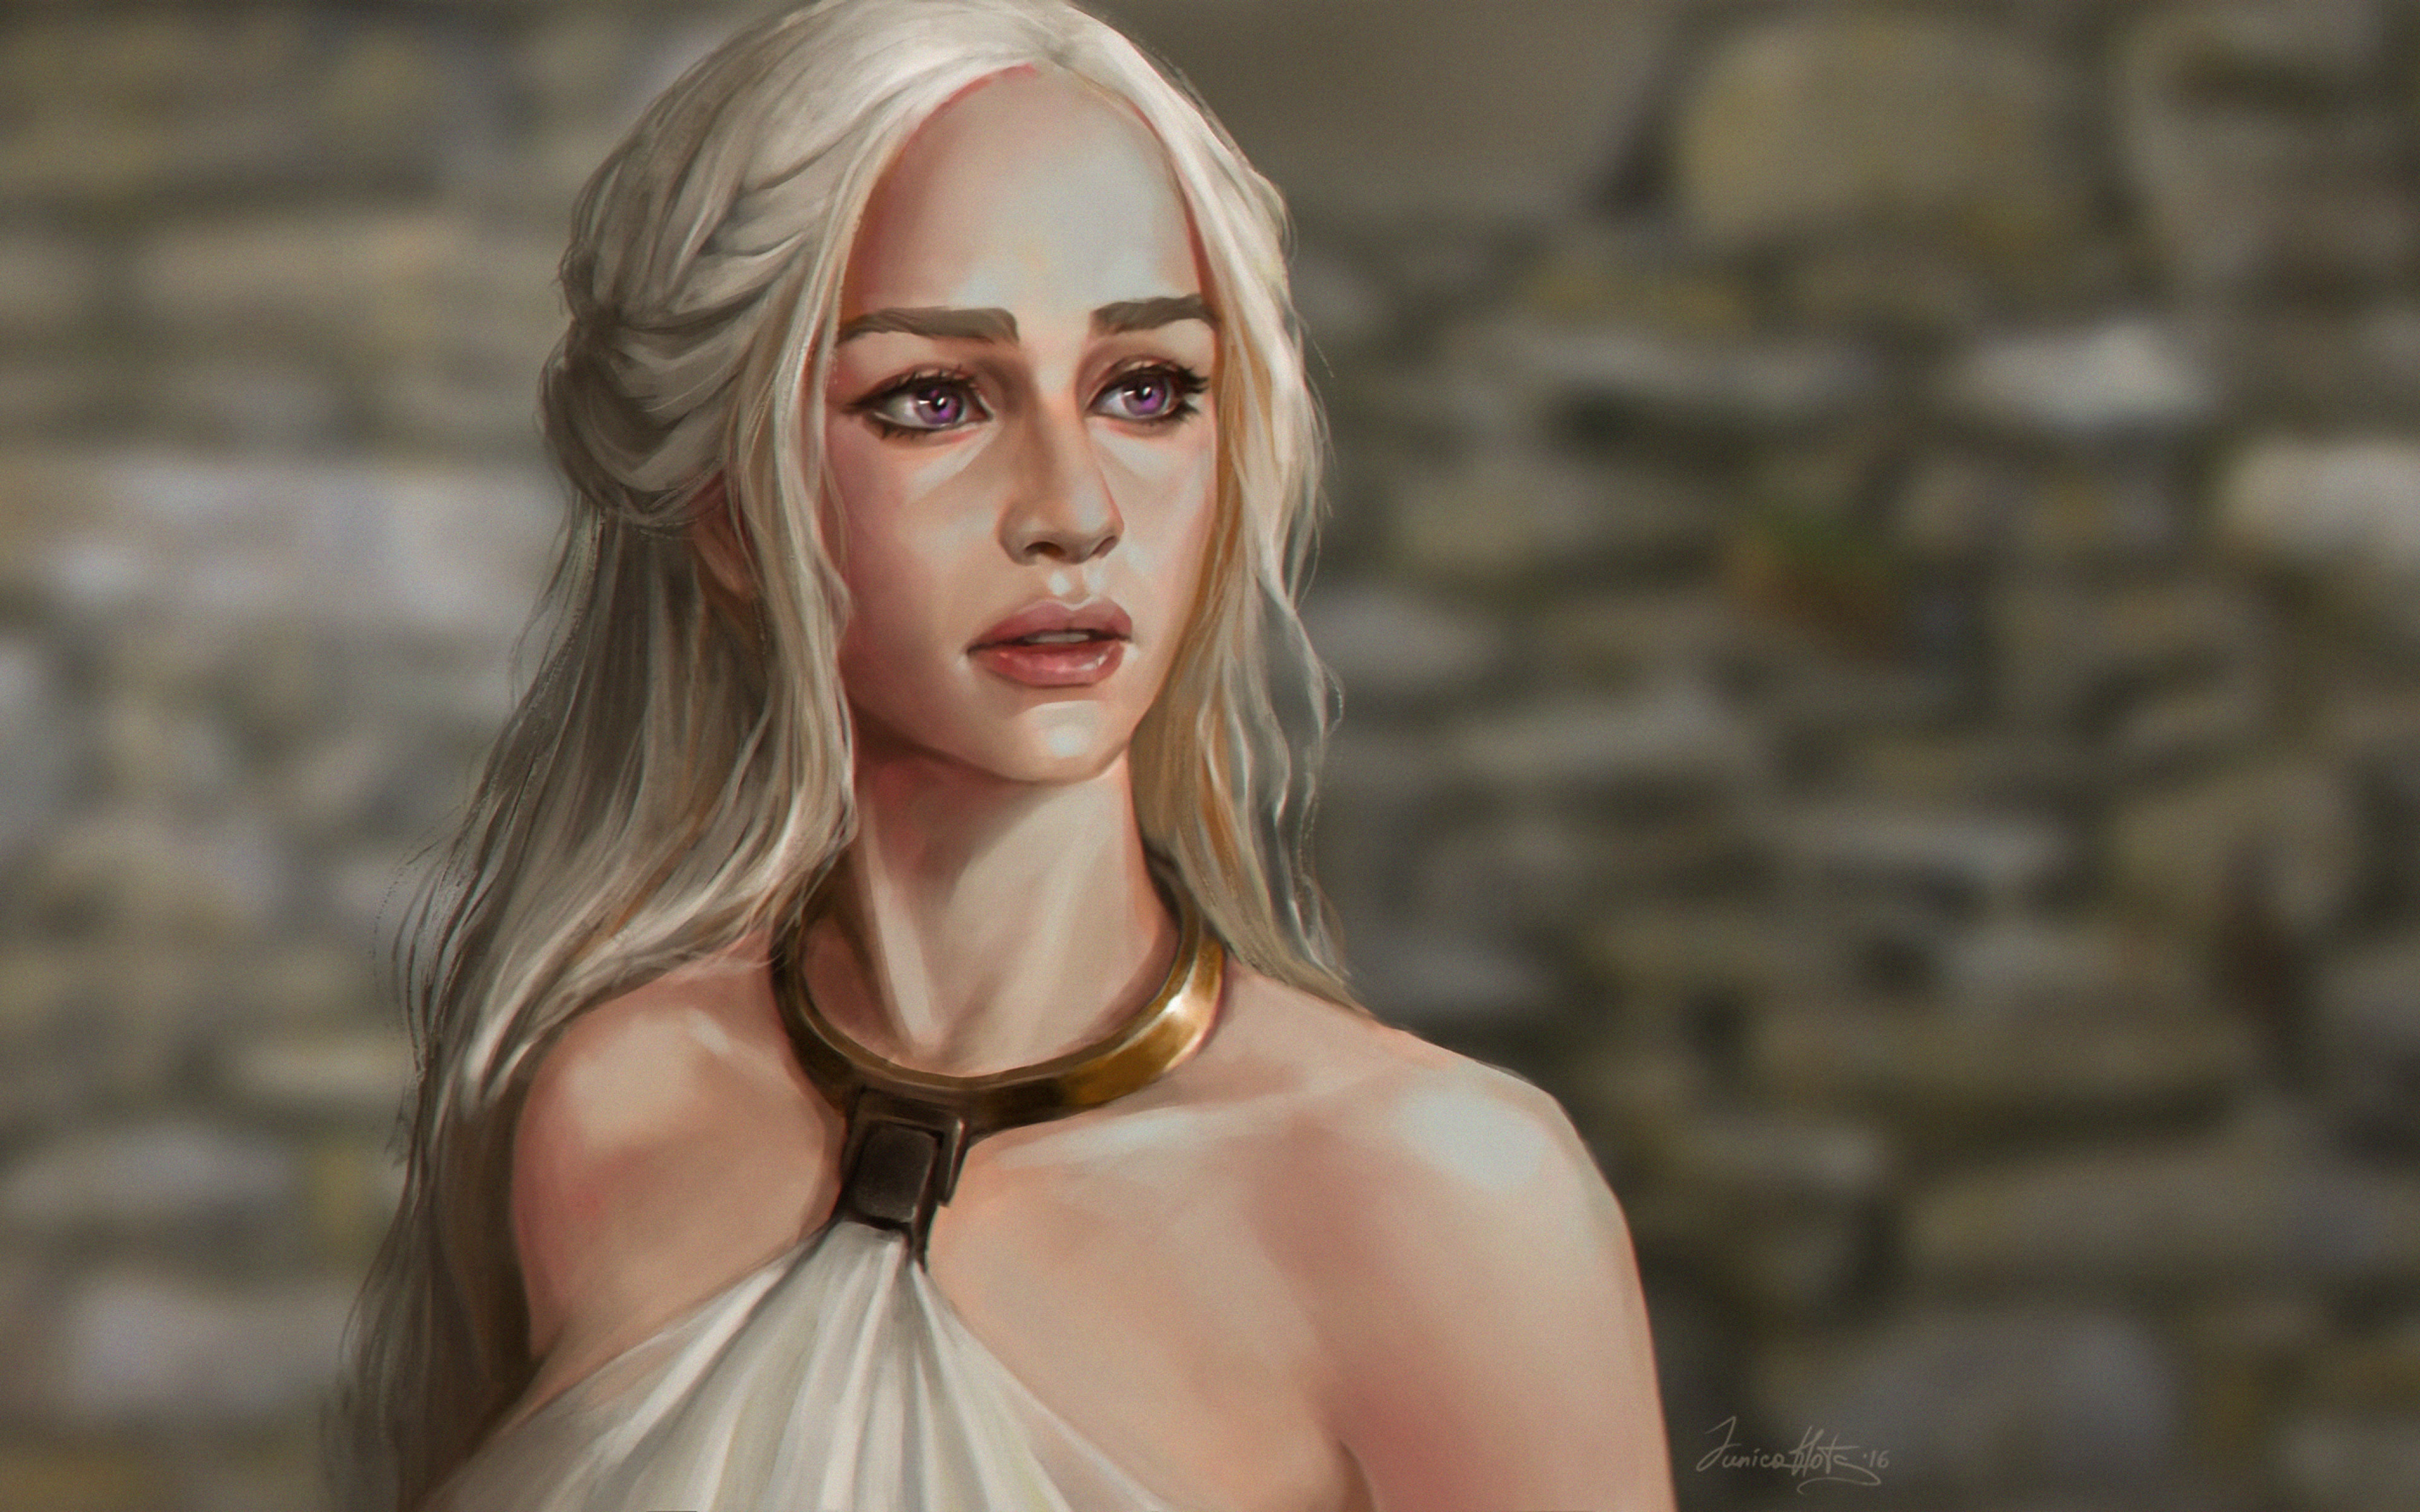 Wallpaper Daenerys Tagaryen Fanart